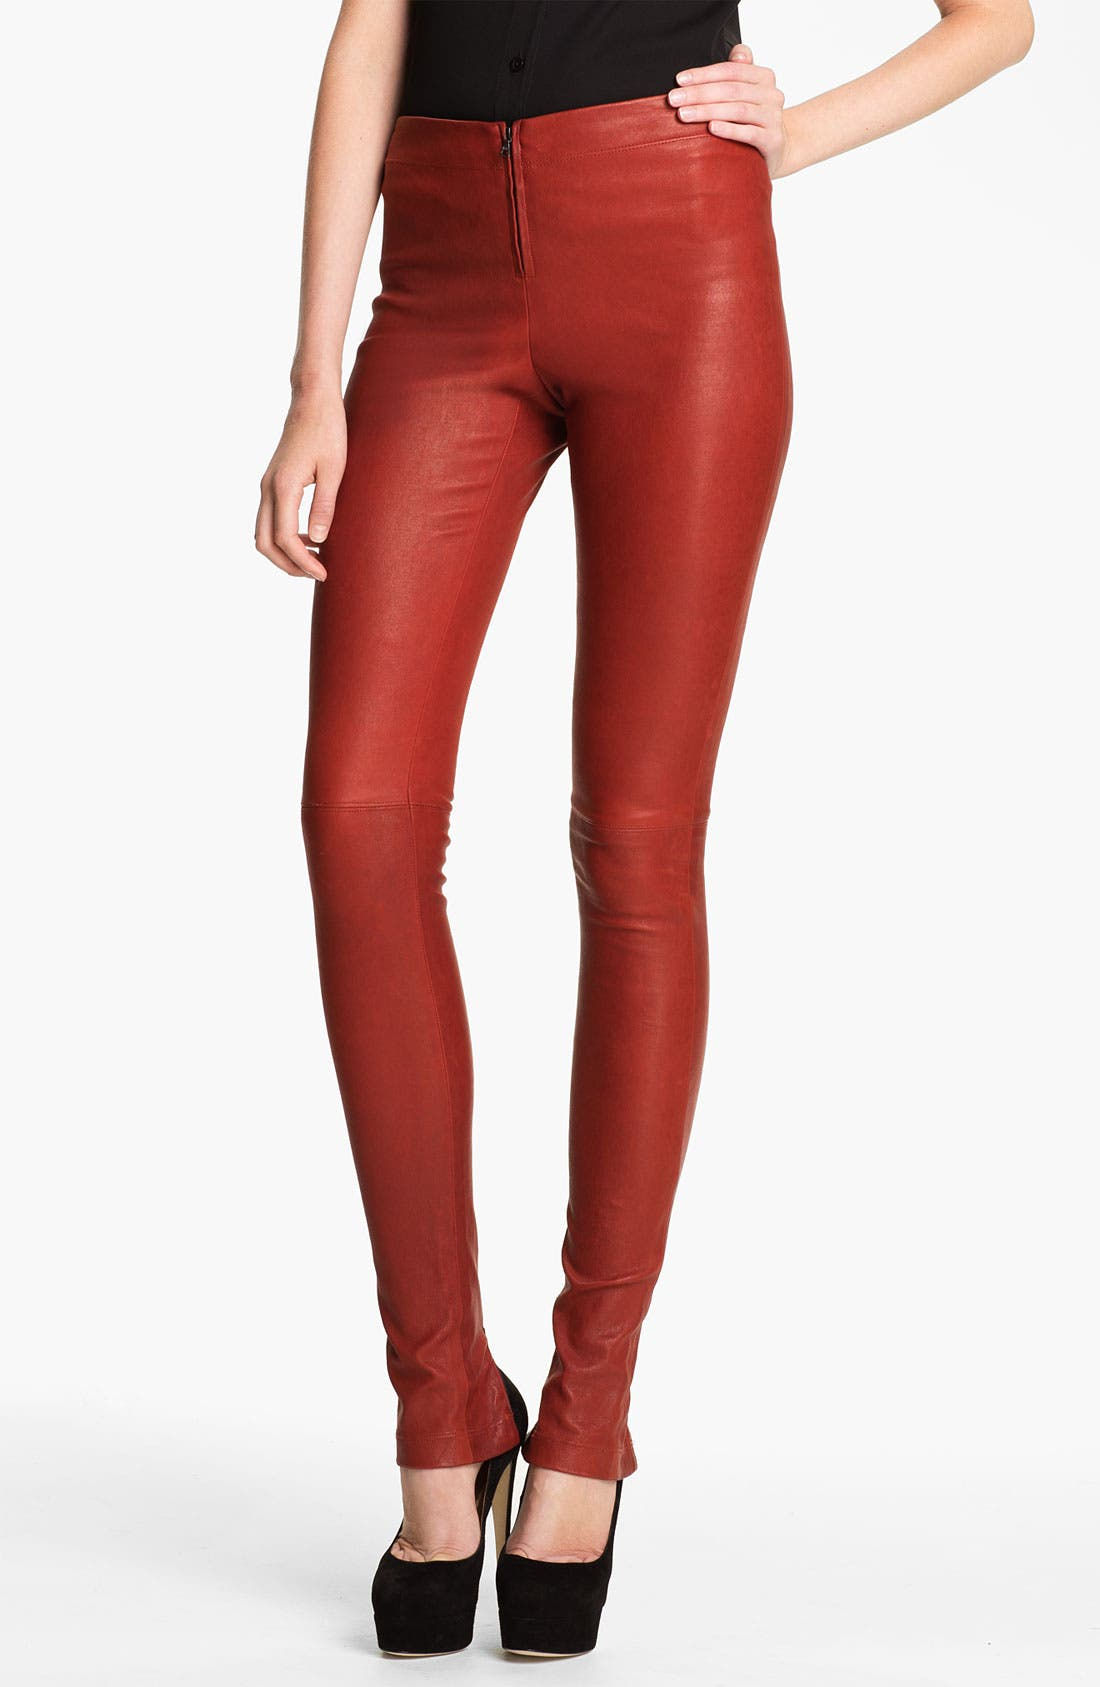 Alternate Image 1 Selected - Alice + Olivia Skinny Lambskin Leather Leggings